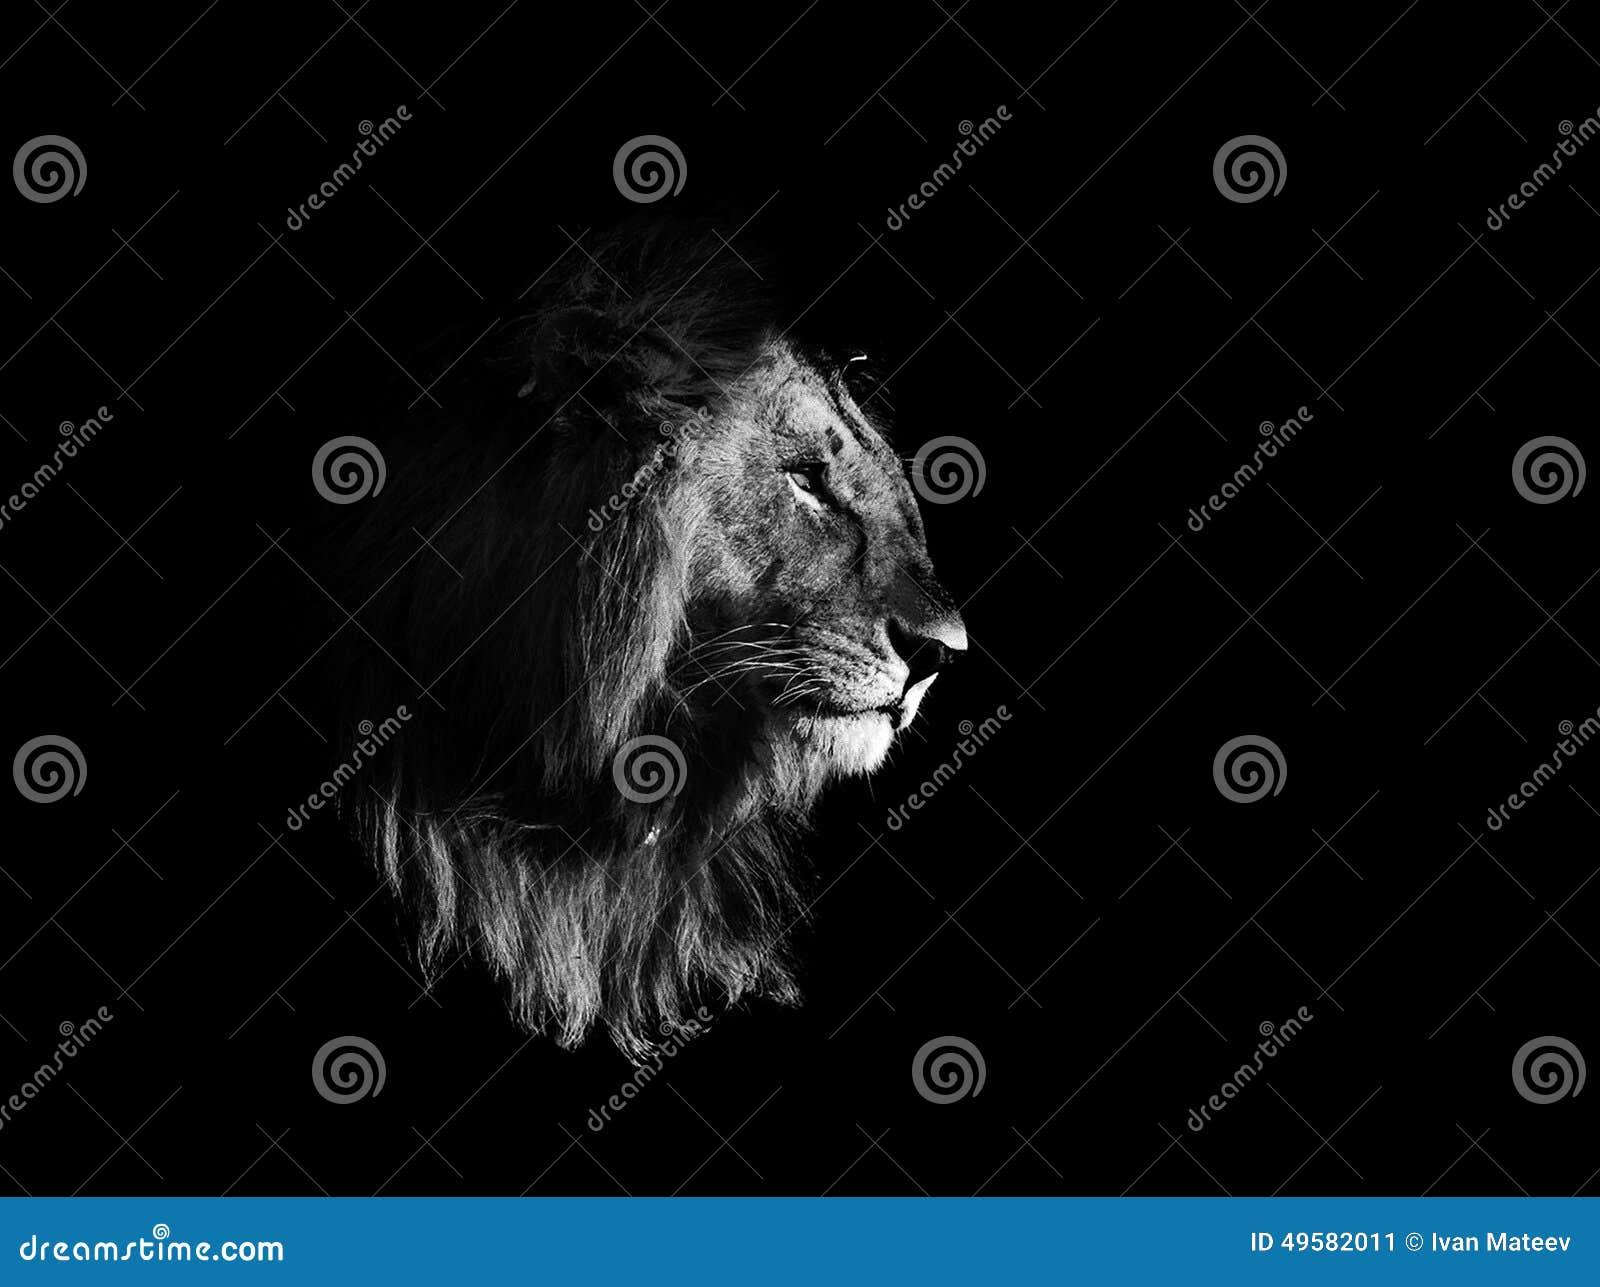 lion noir et blanc image stock image du animal noir. Black Bedroom Furniture Sets. Home Design Ideas